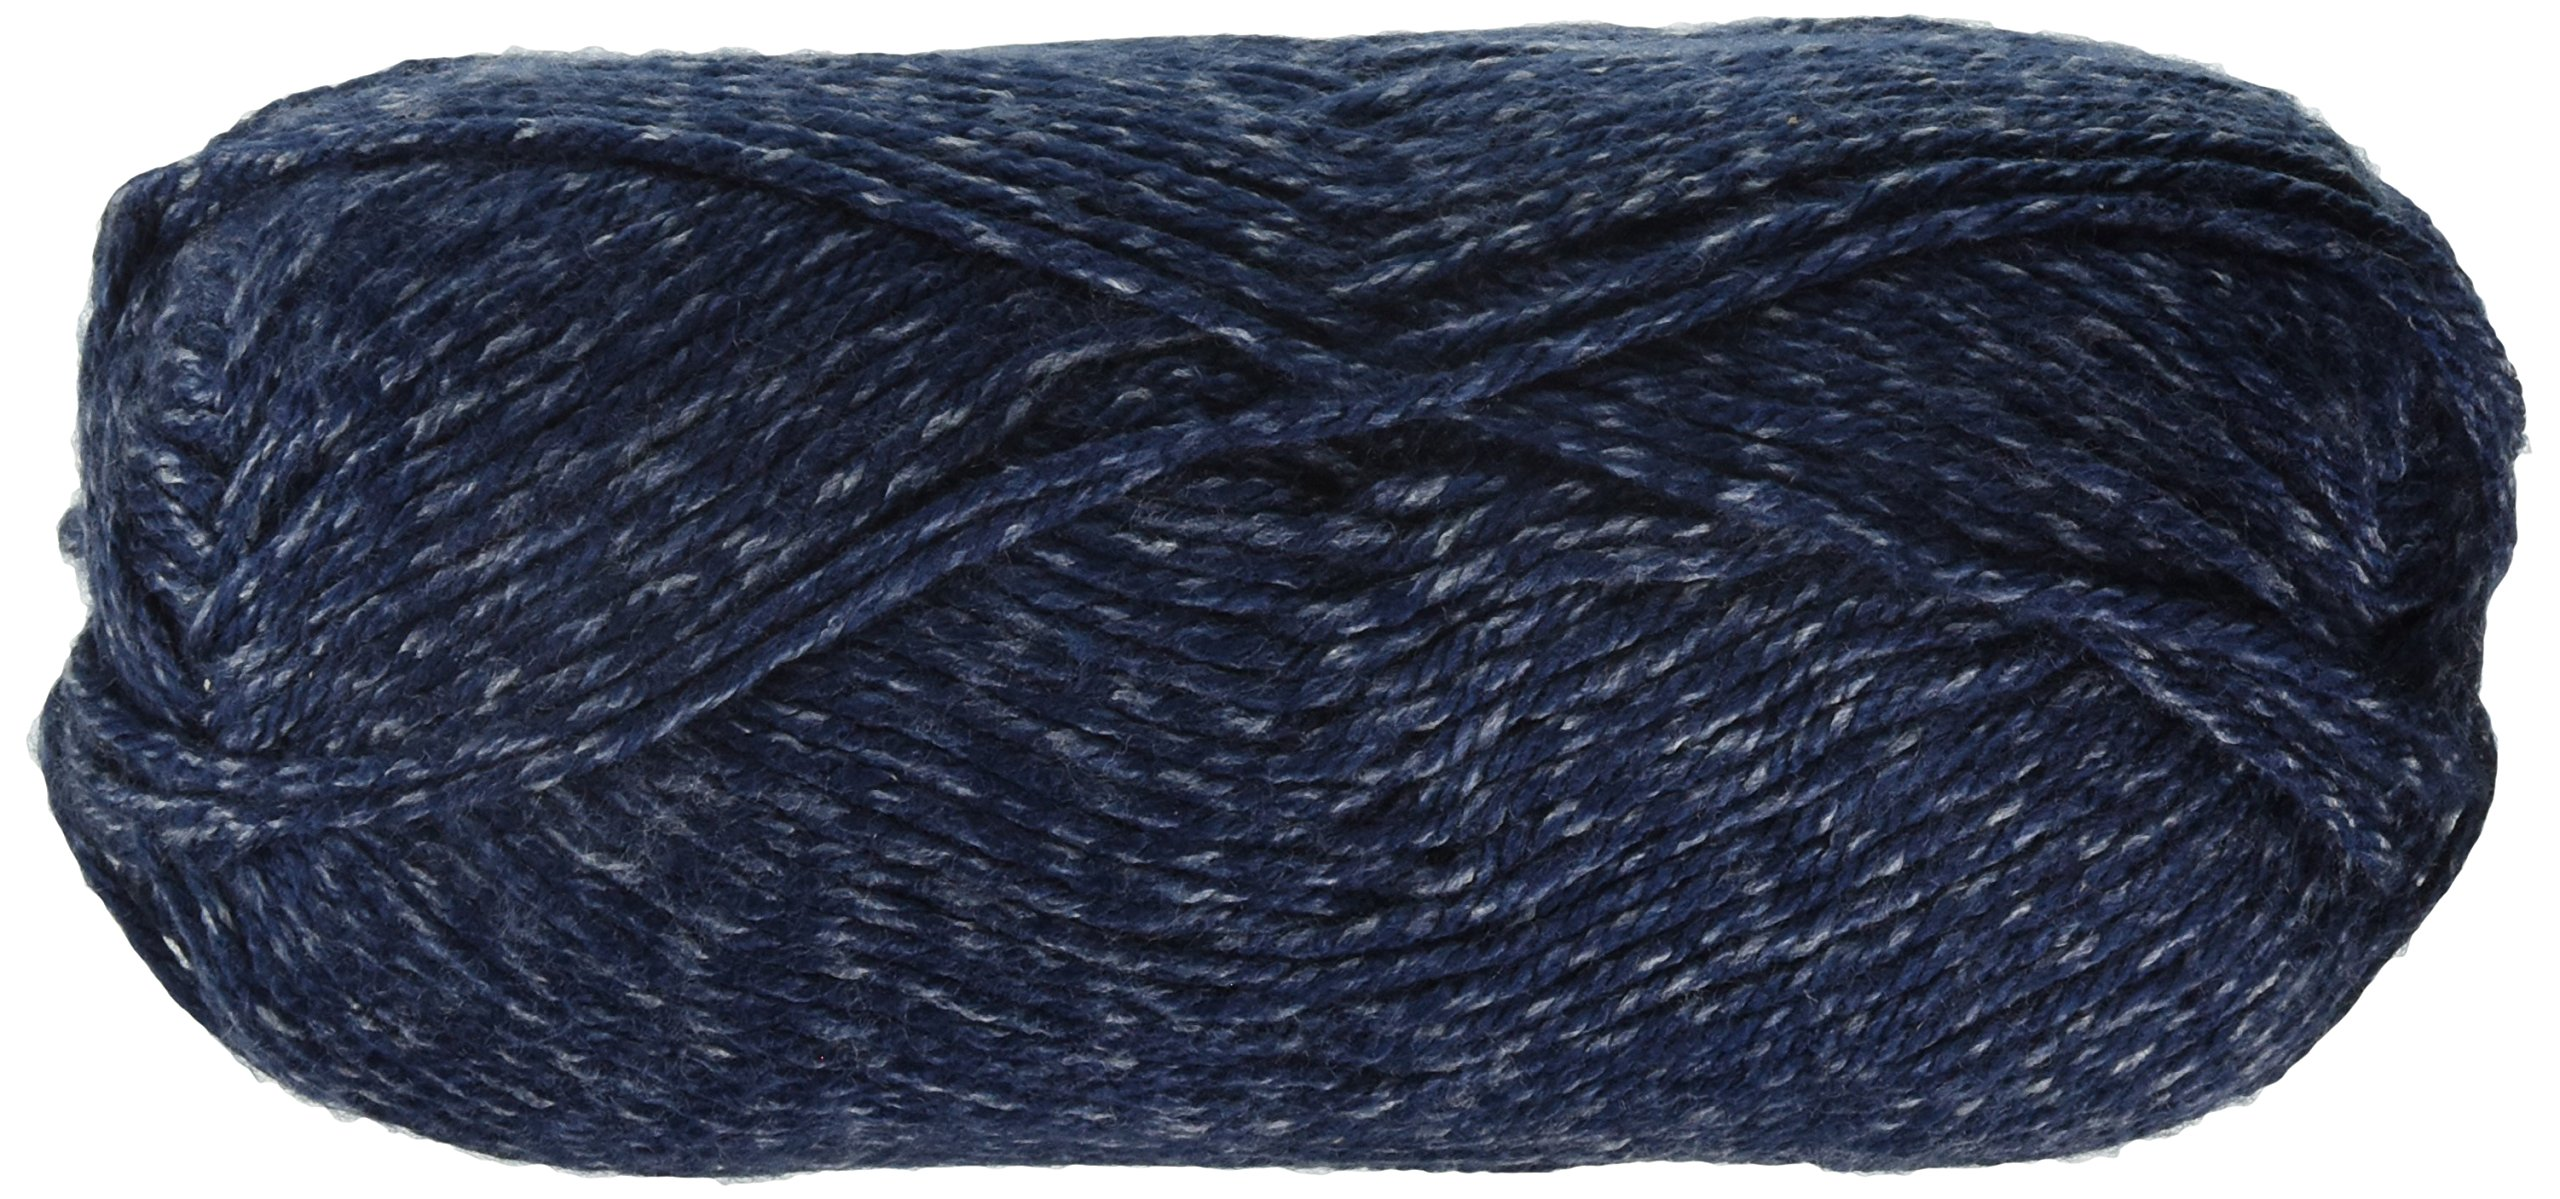 Premier Yarns 110-06 Everyday Soft Worsted Heather Yarn-Deep Sea by Premier Yarns (Image #2)